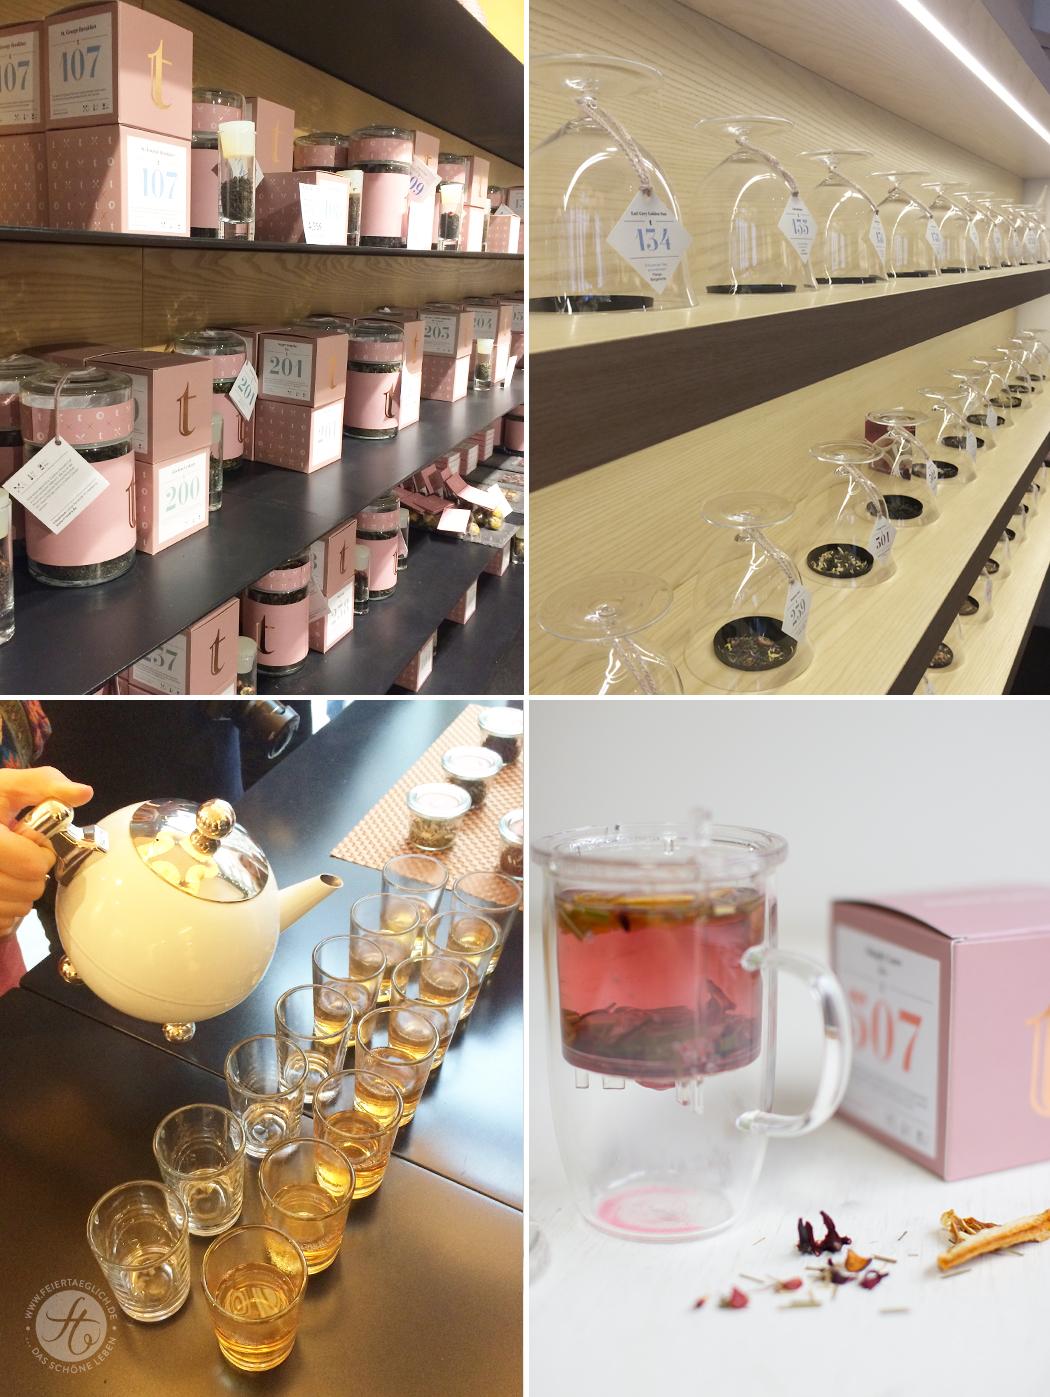 Bredemeijer-tea tasting bei t. by t.lovers